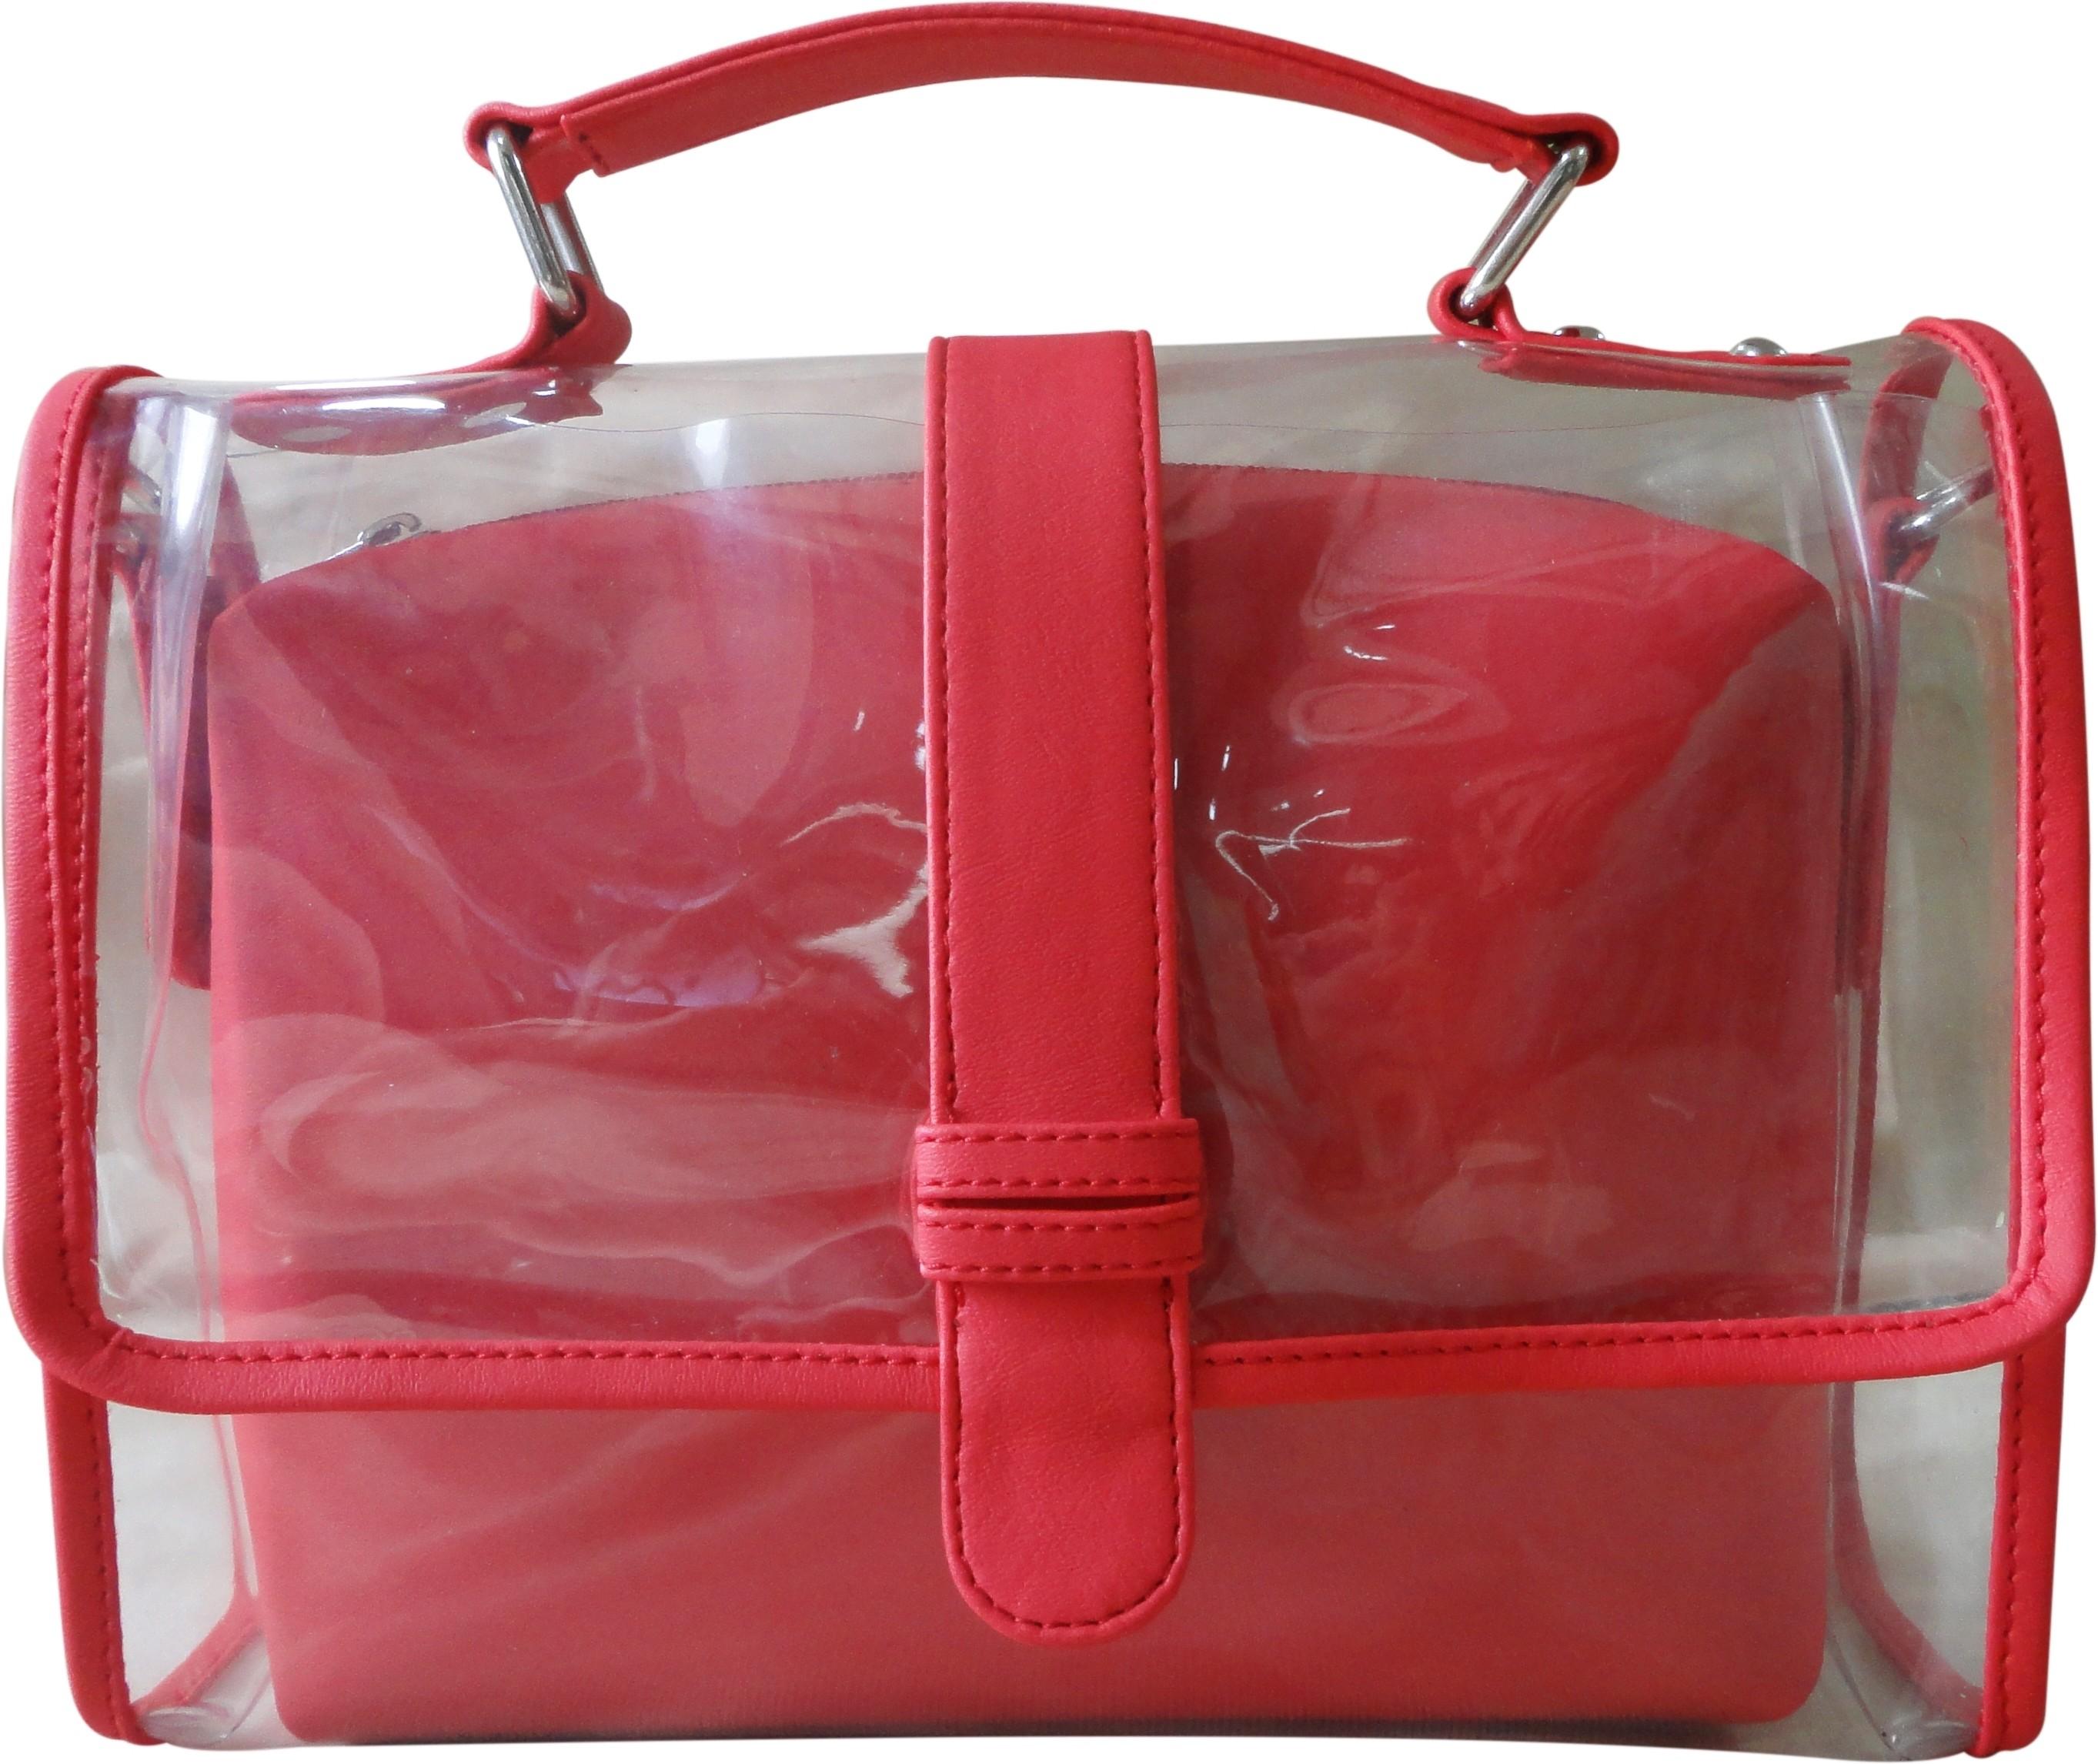 New Khiora Eva Shoulder Bag Brown  Price In India  Flipkartcom